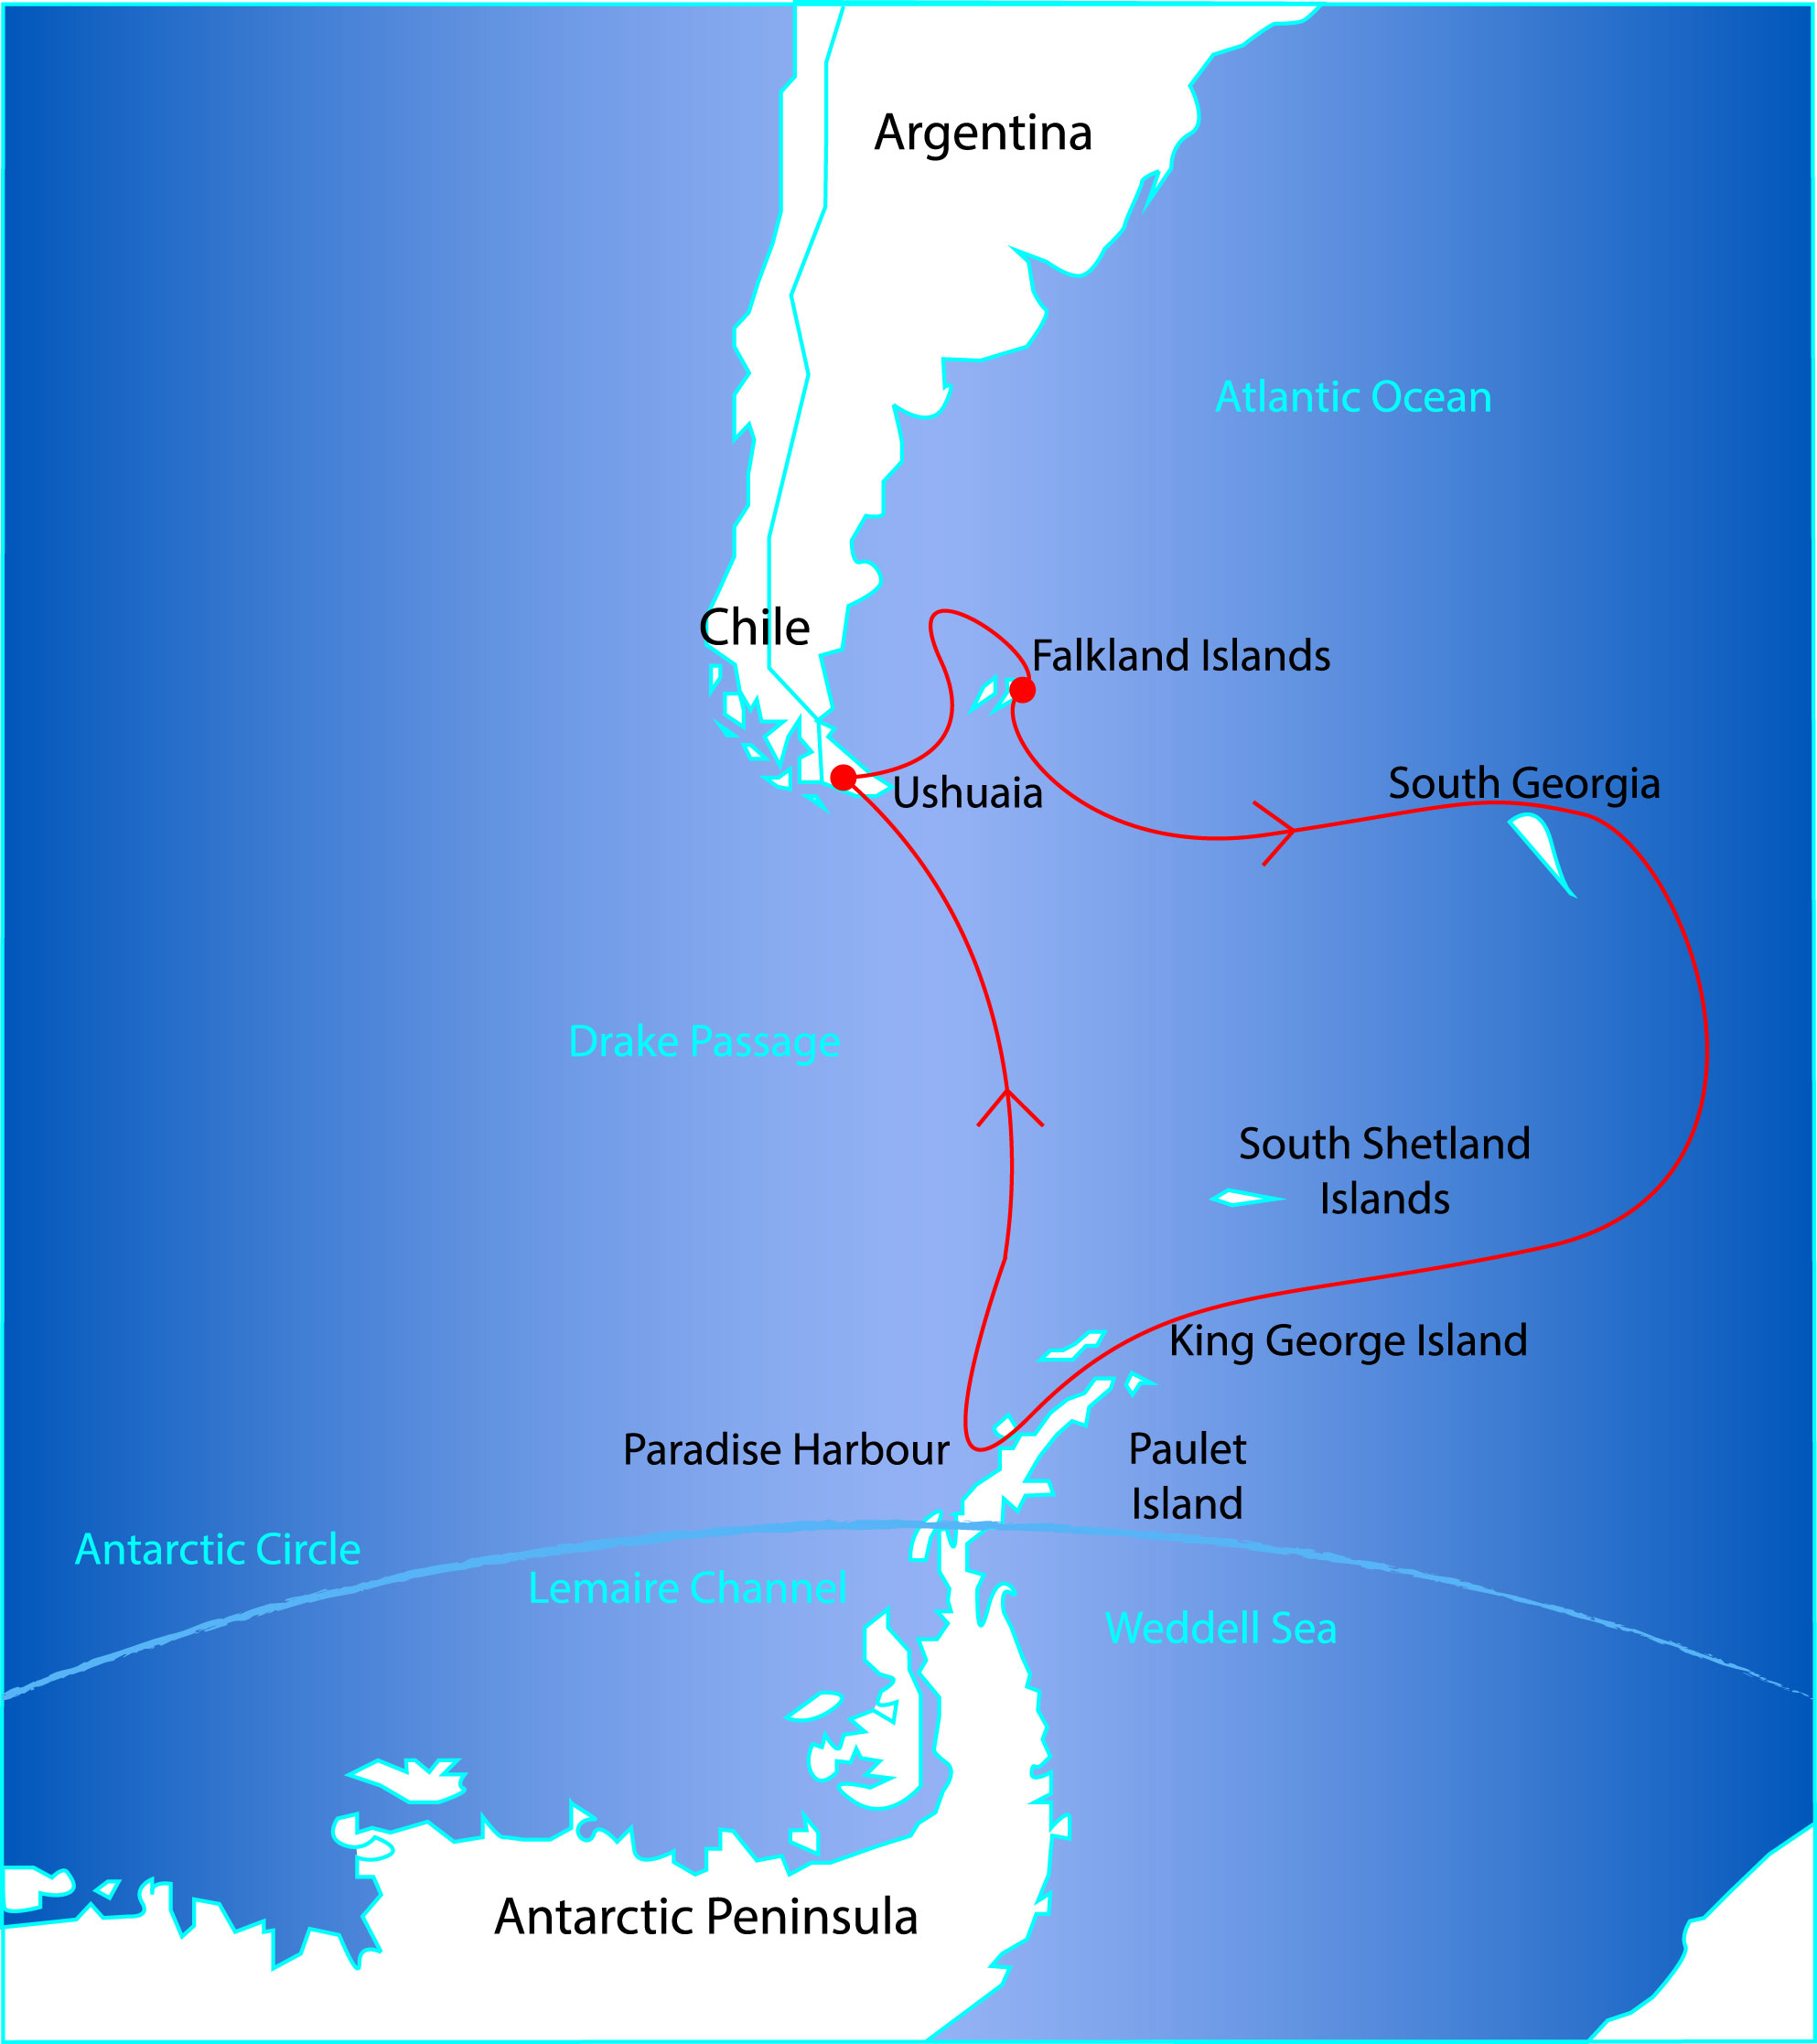 Route Map for the Antarctica Via Falklands and South Georgia Cruise